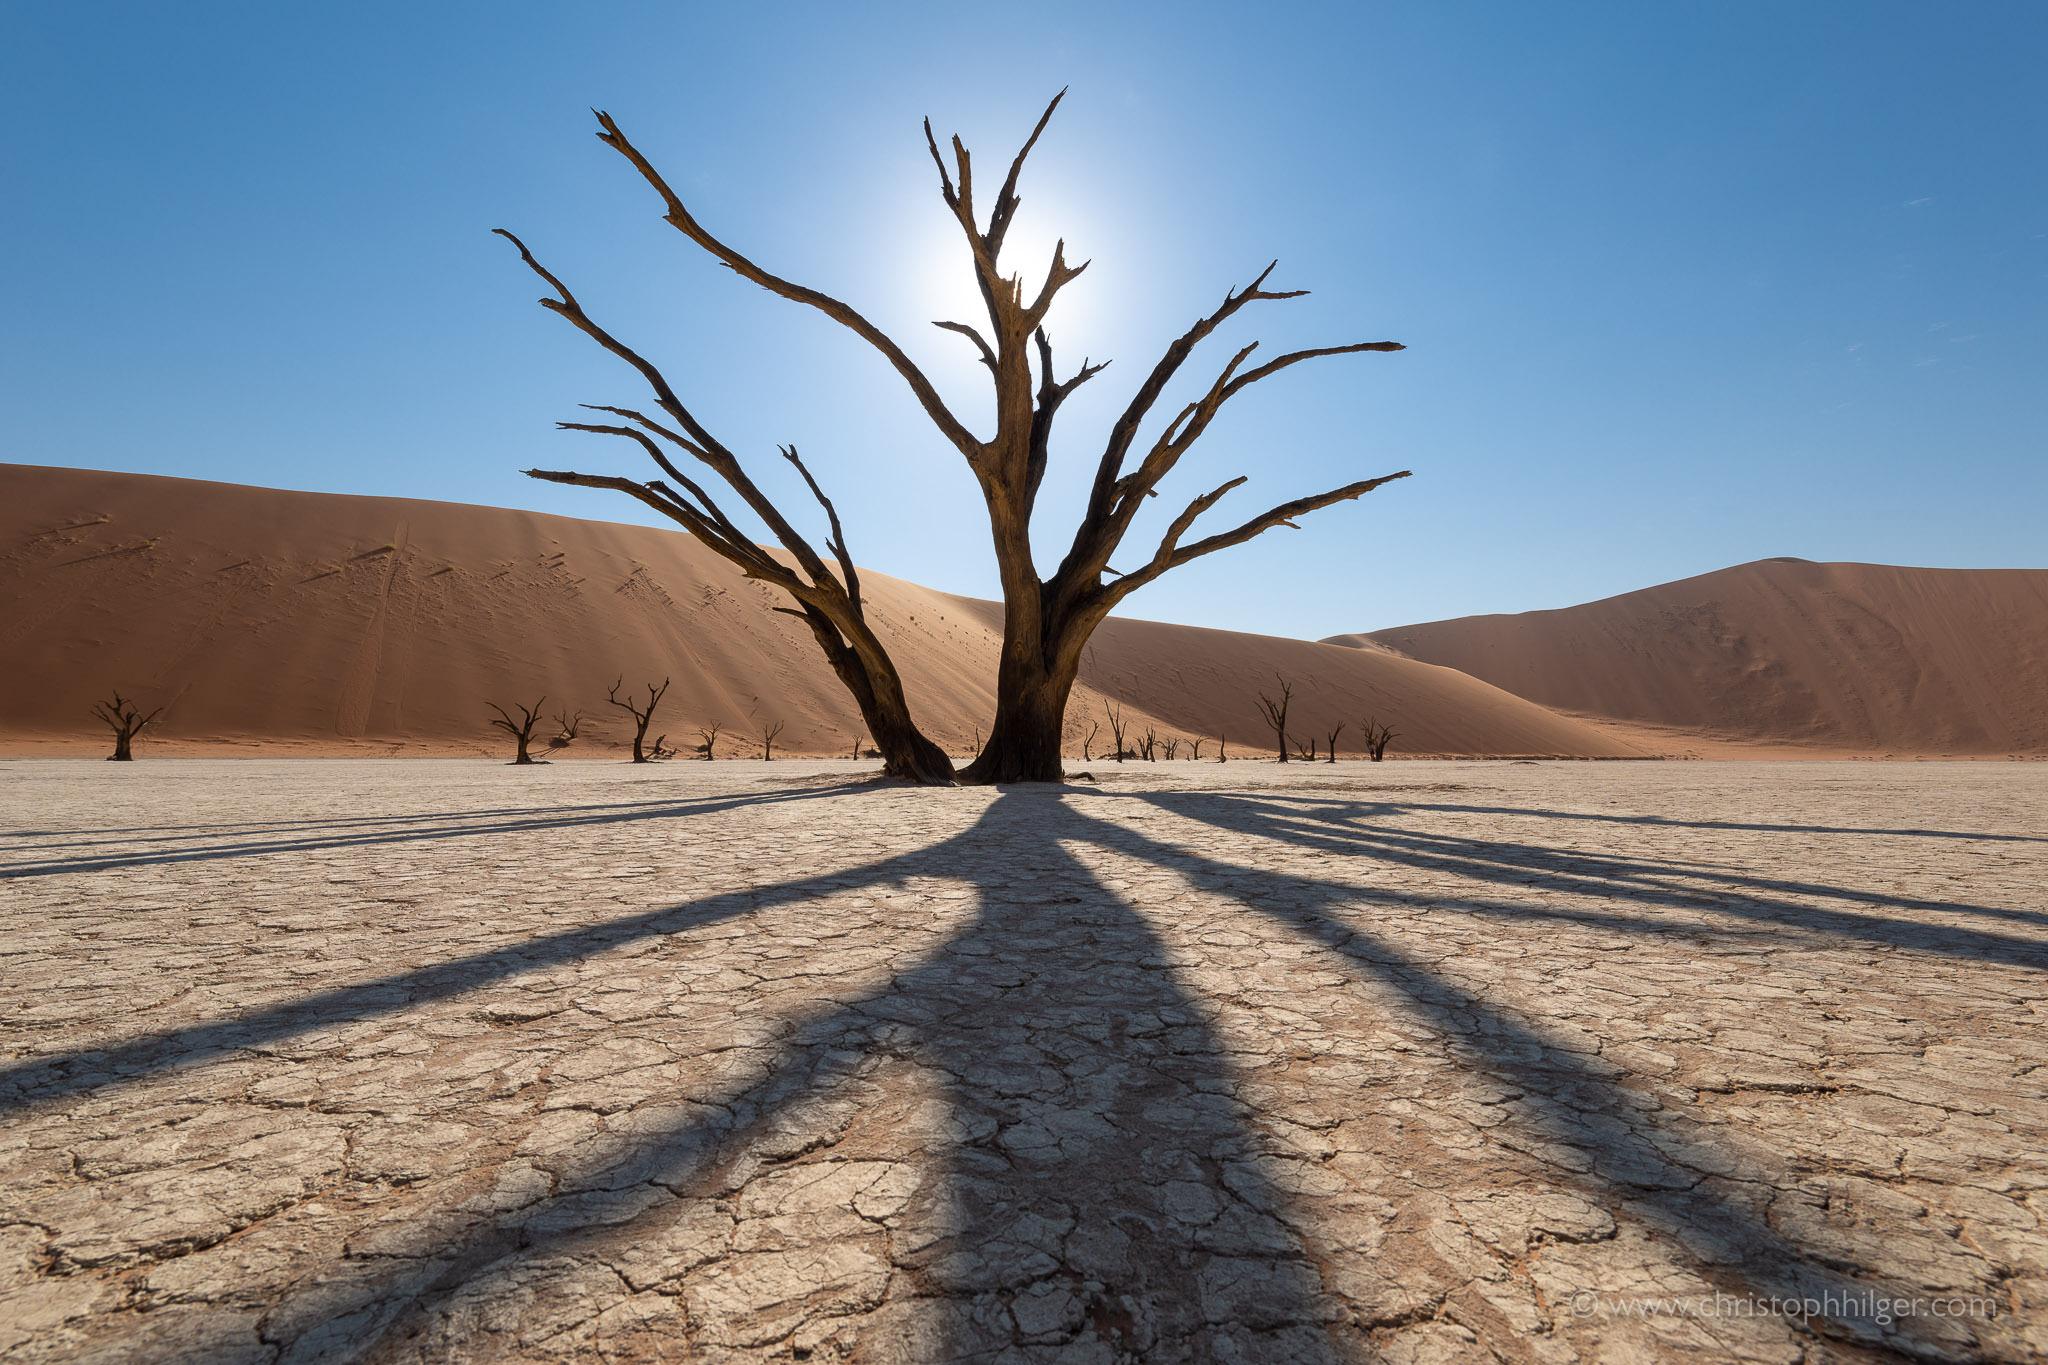 Abgestorbener, alter Kameldornbaum im Deadvlei, Sossusvlei, Namibia